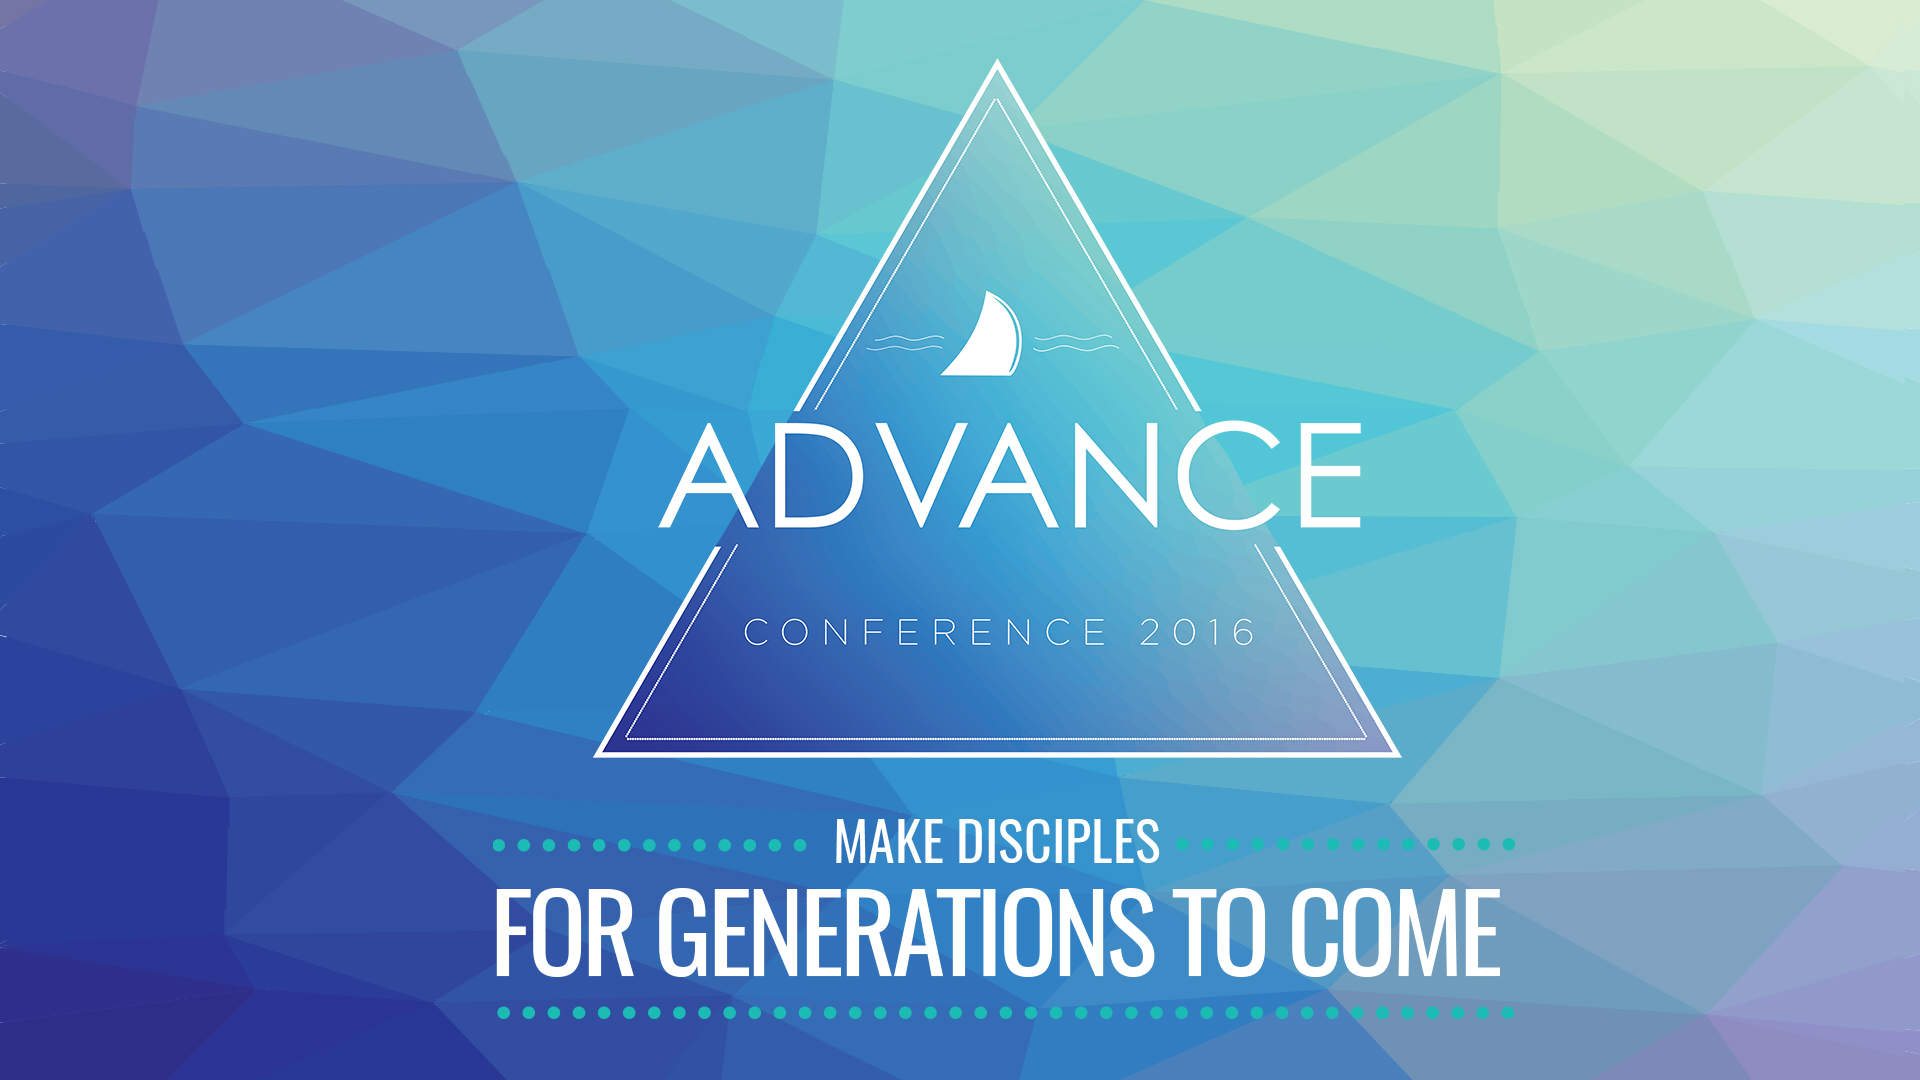 Advance Conference 2016